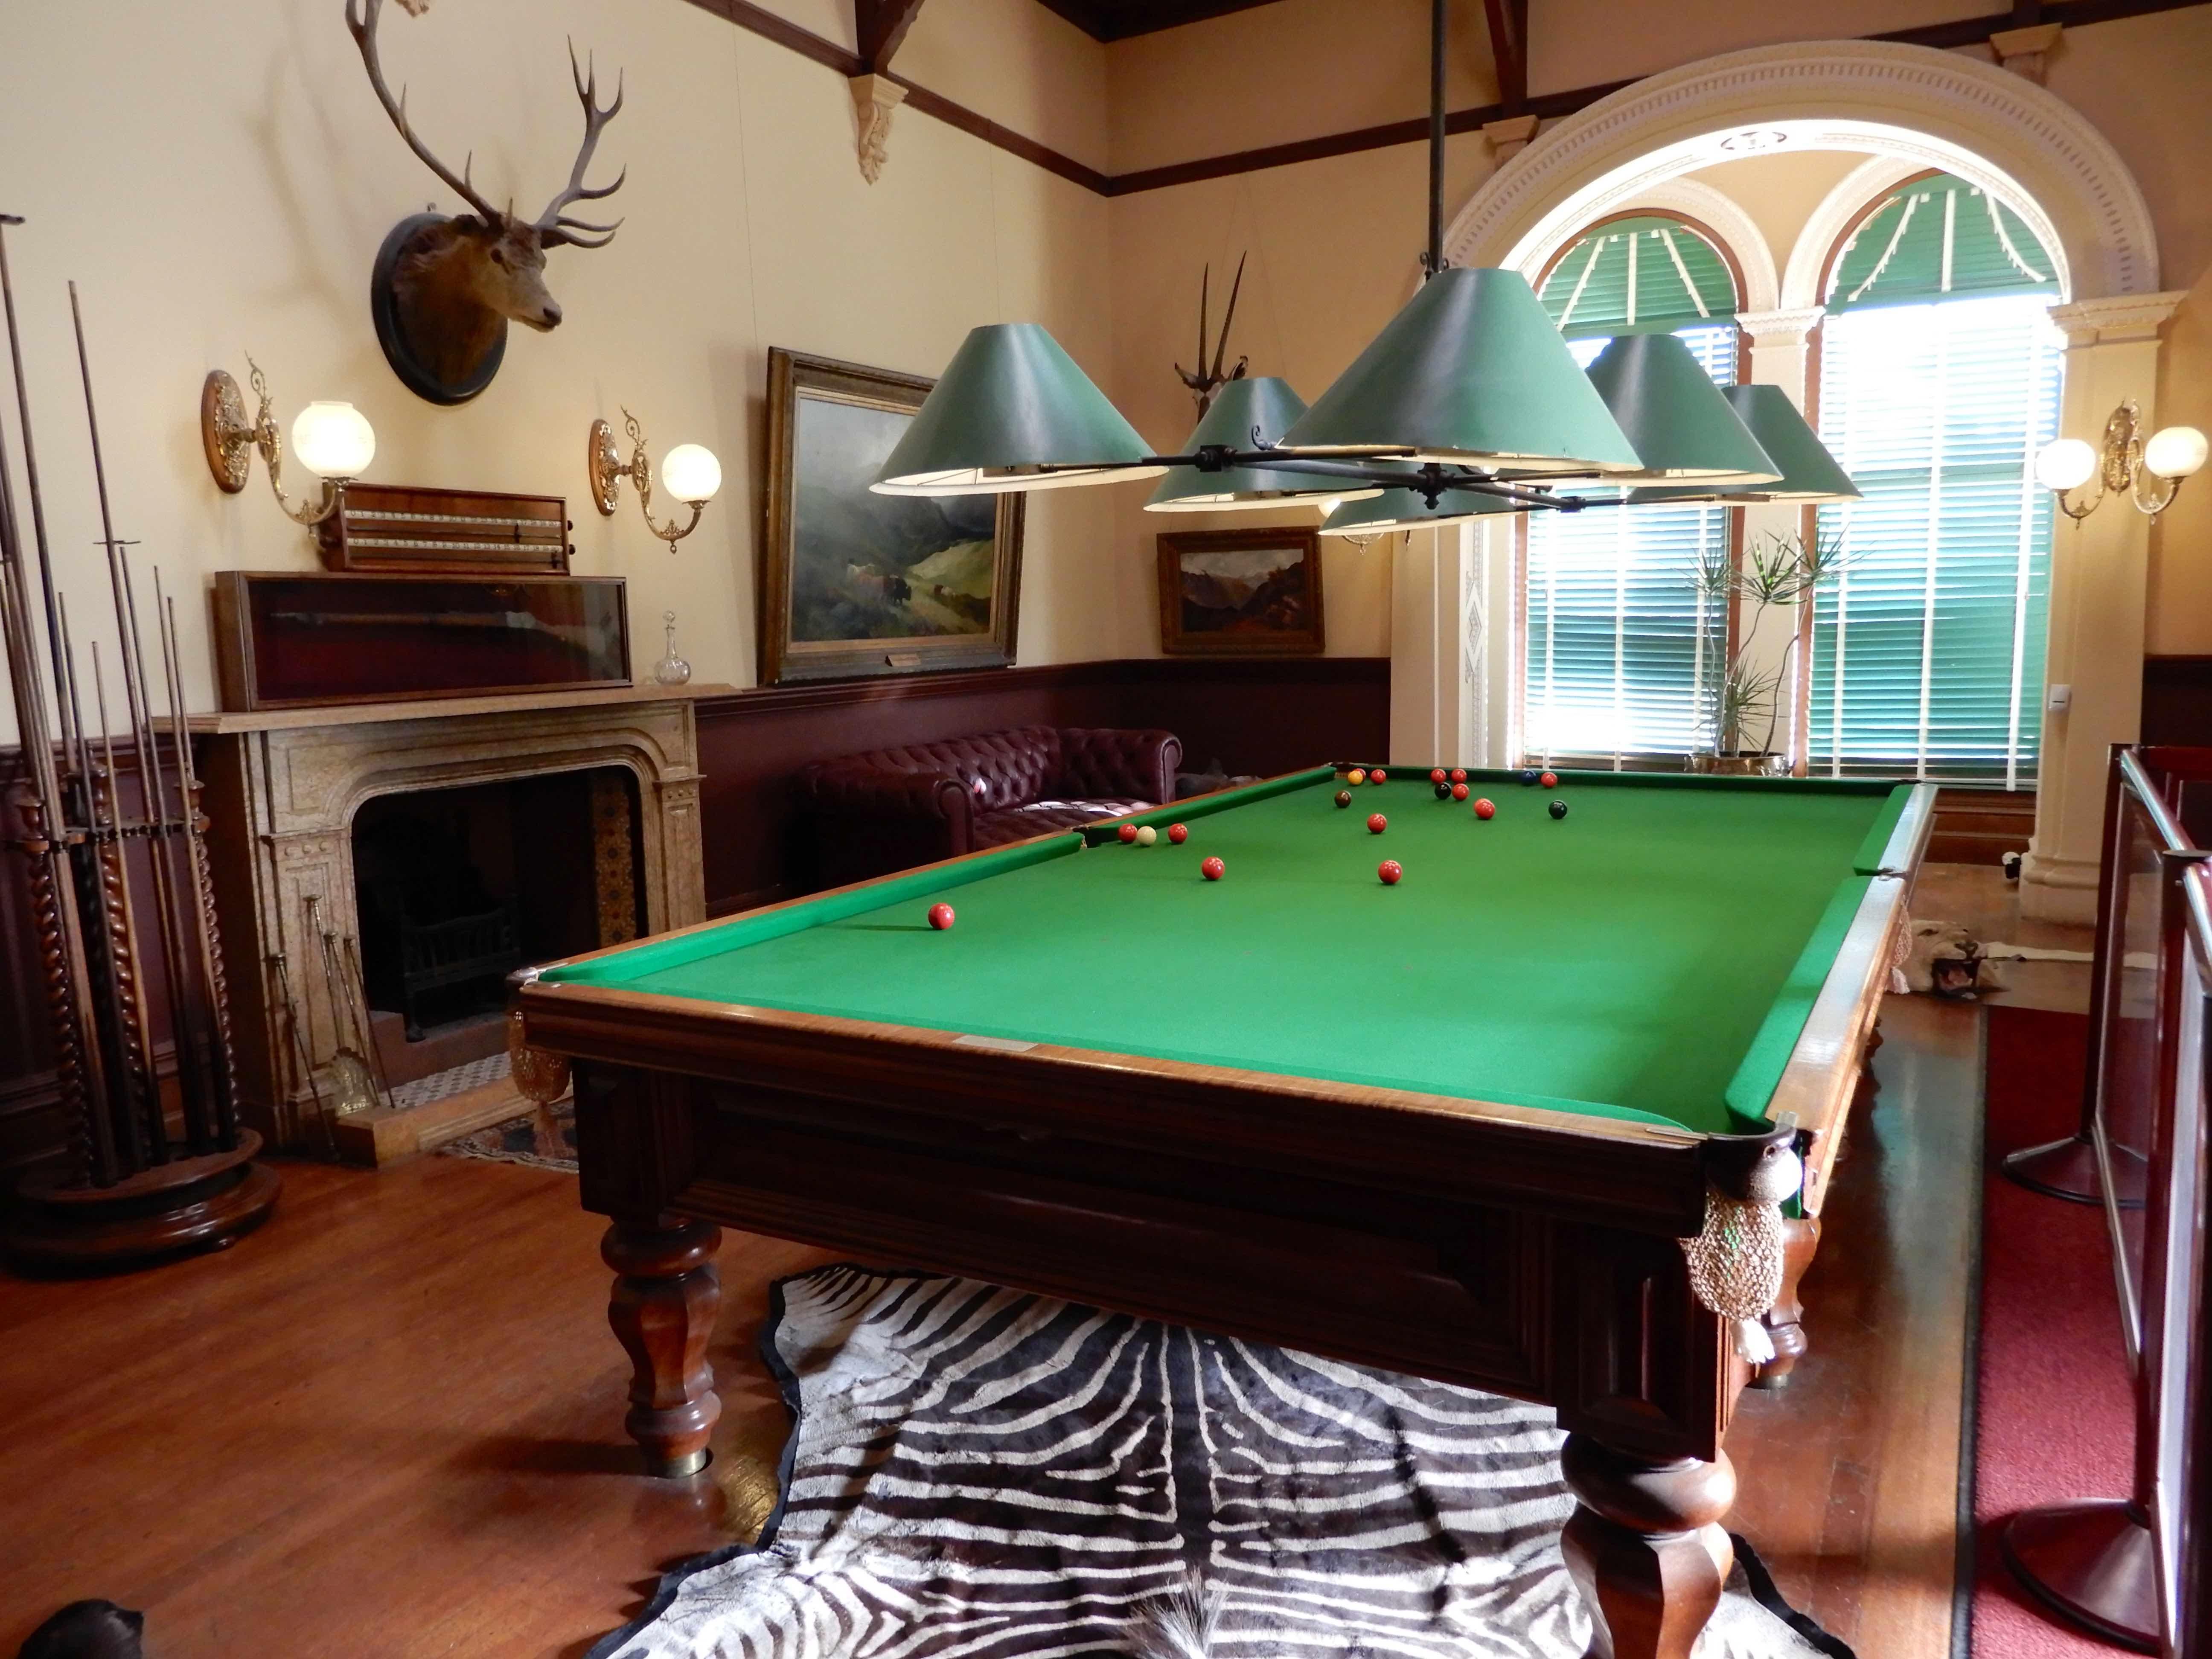 18.billiard room